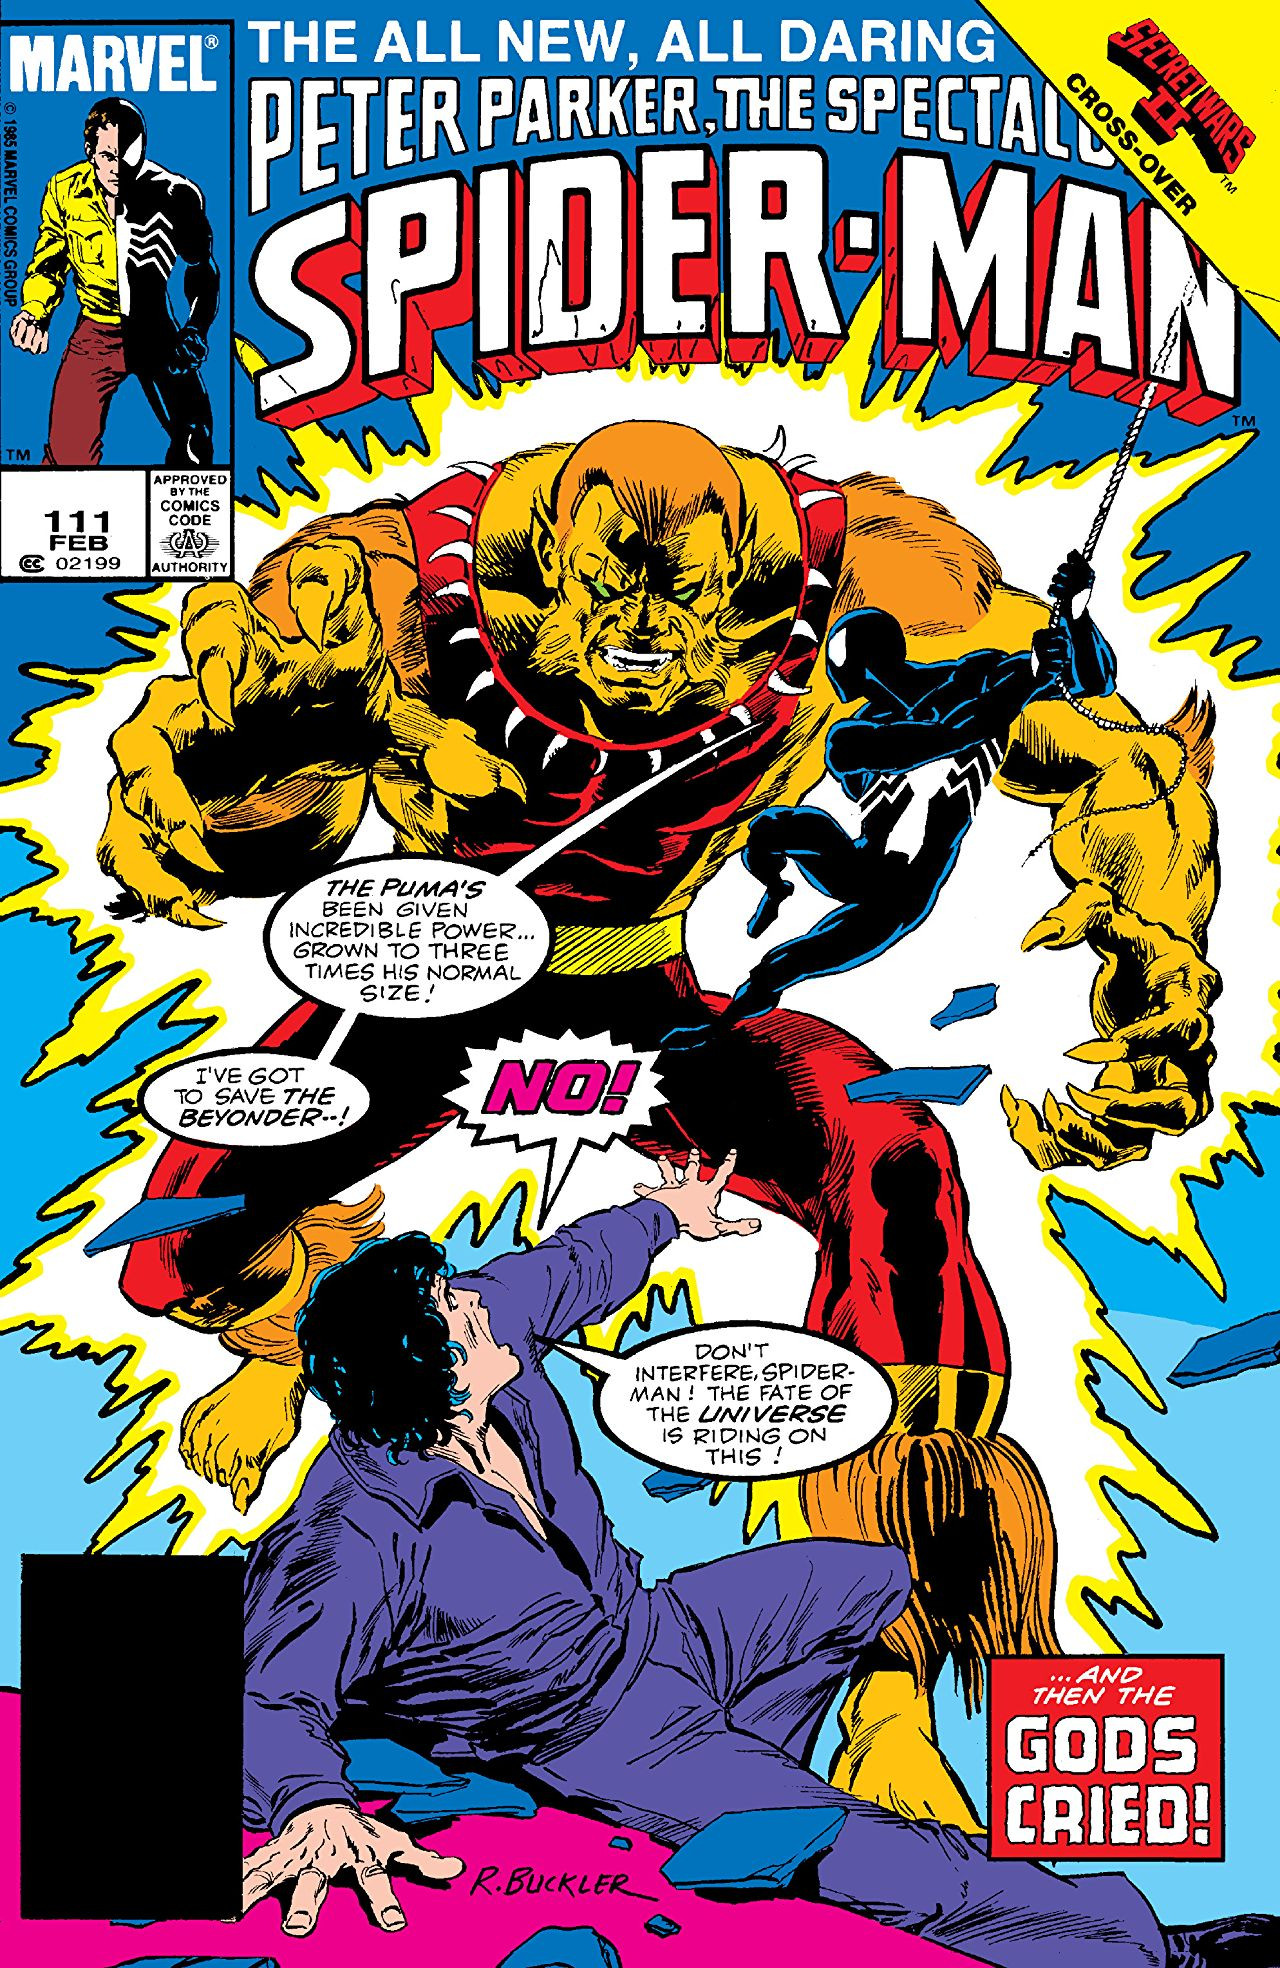 Peter Parker, The Spectacular Spider-Man Vol 1 111